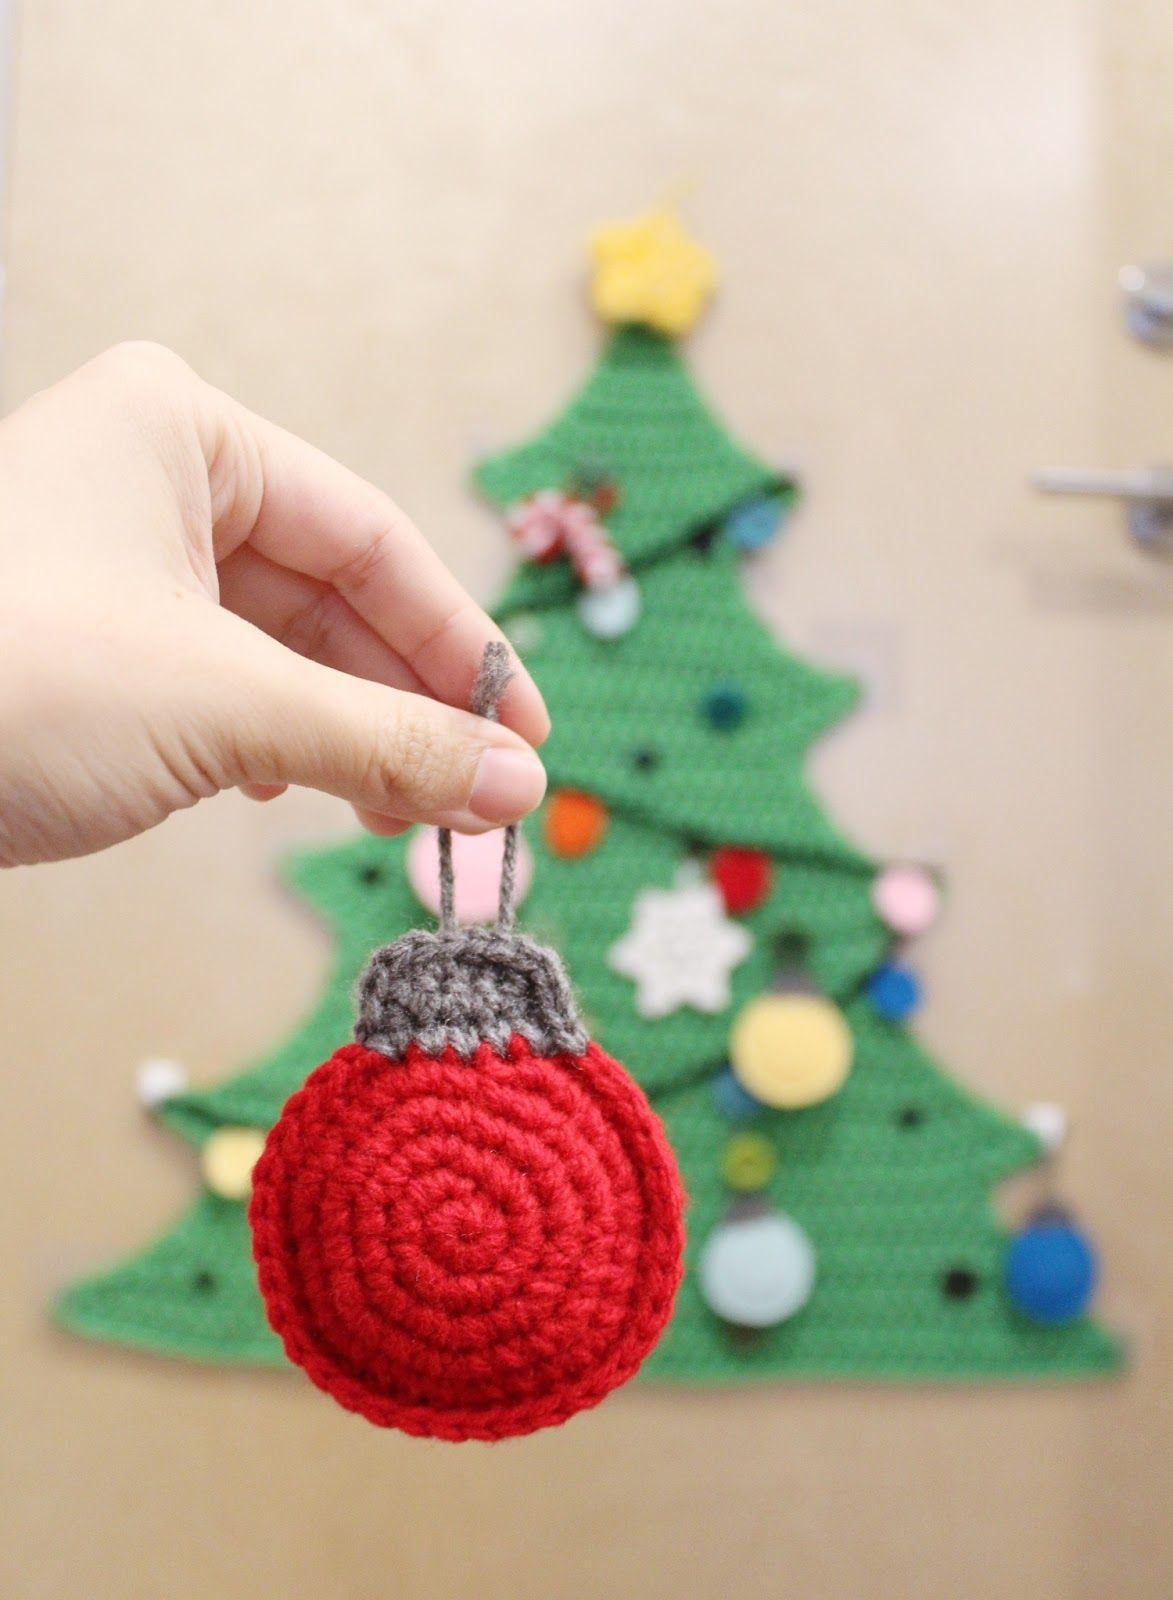 Flatland Christmas Bauble Ornaments Crochet Pattern Crochet Christmas Ornaments Free Christmas Crochet Patterns Crochet Christmas Decorations